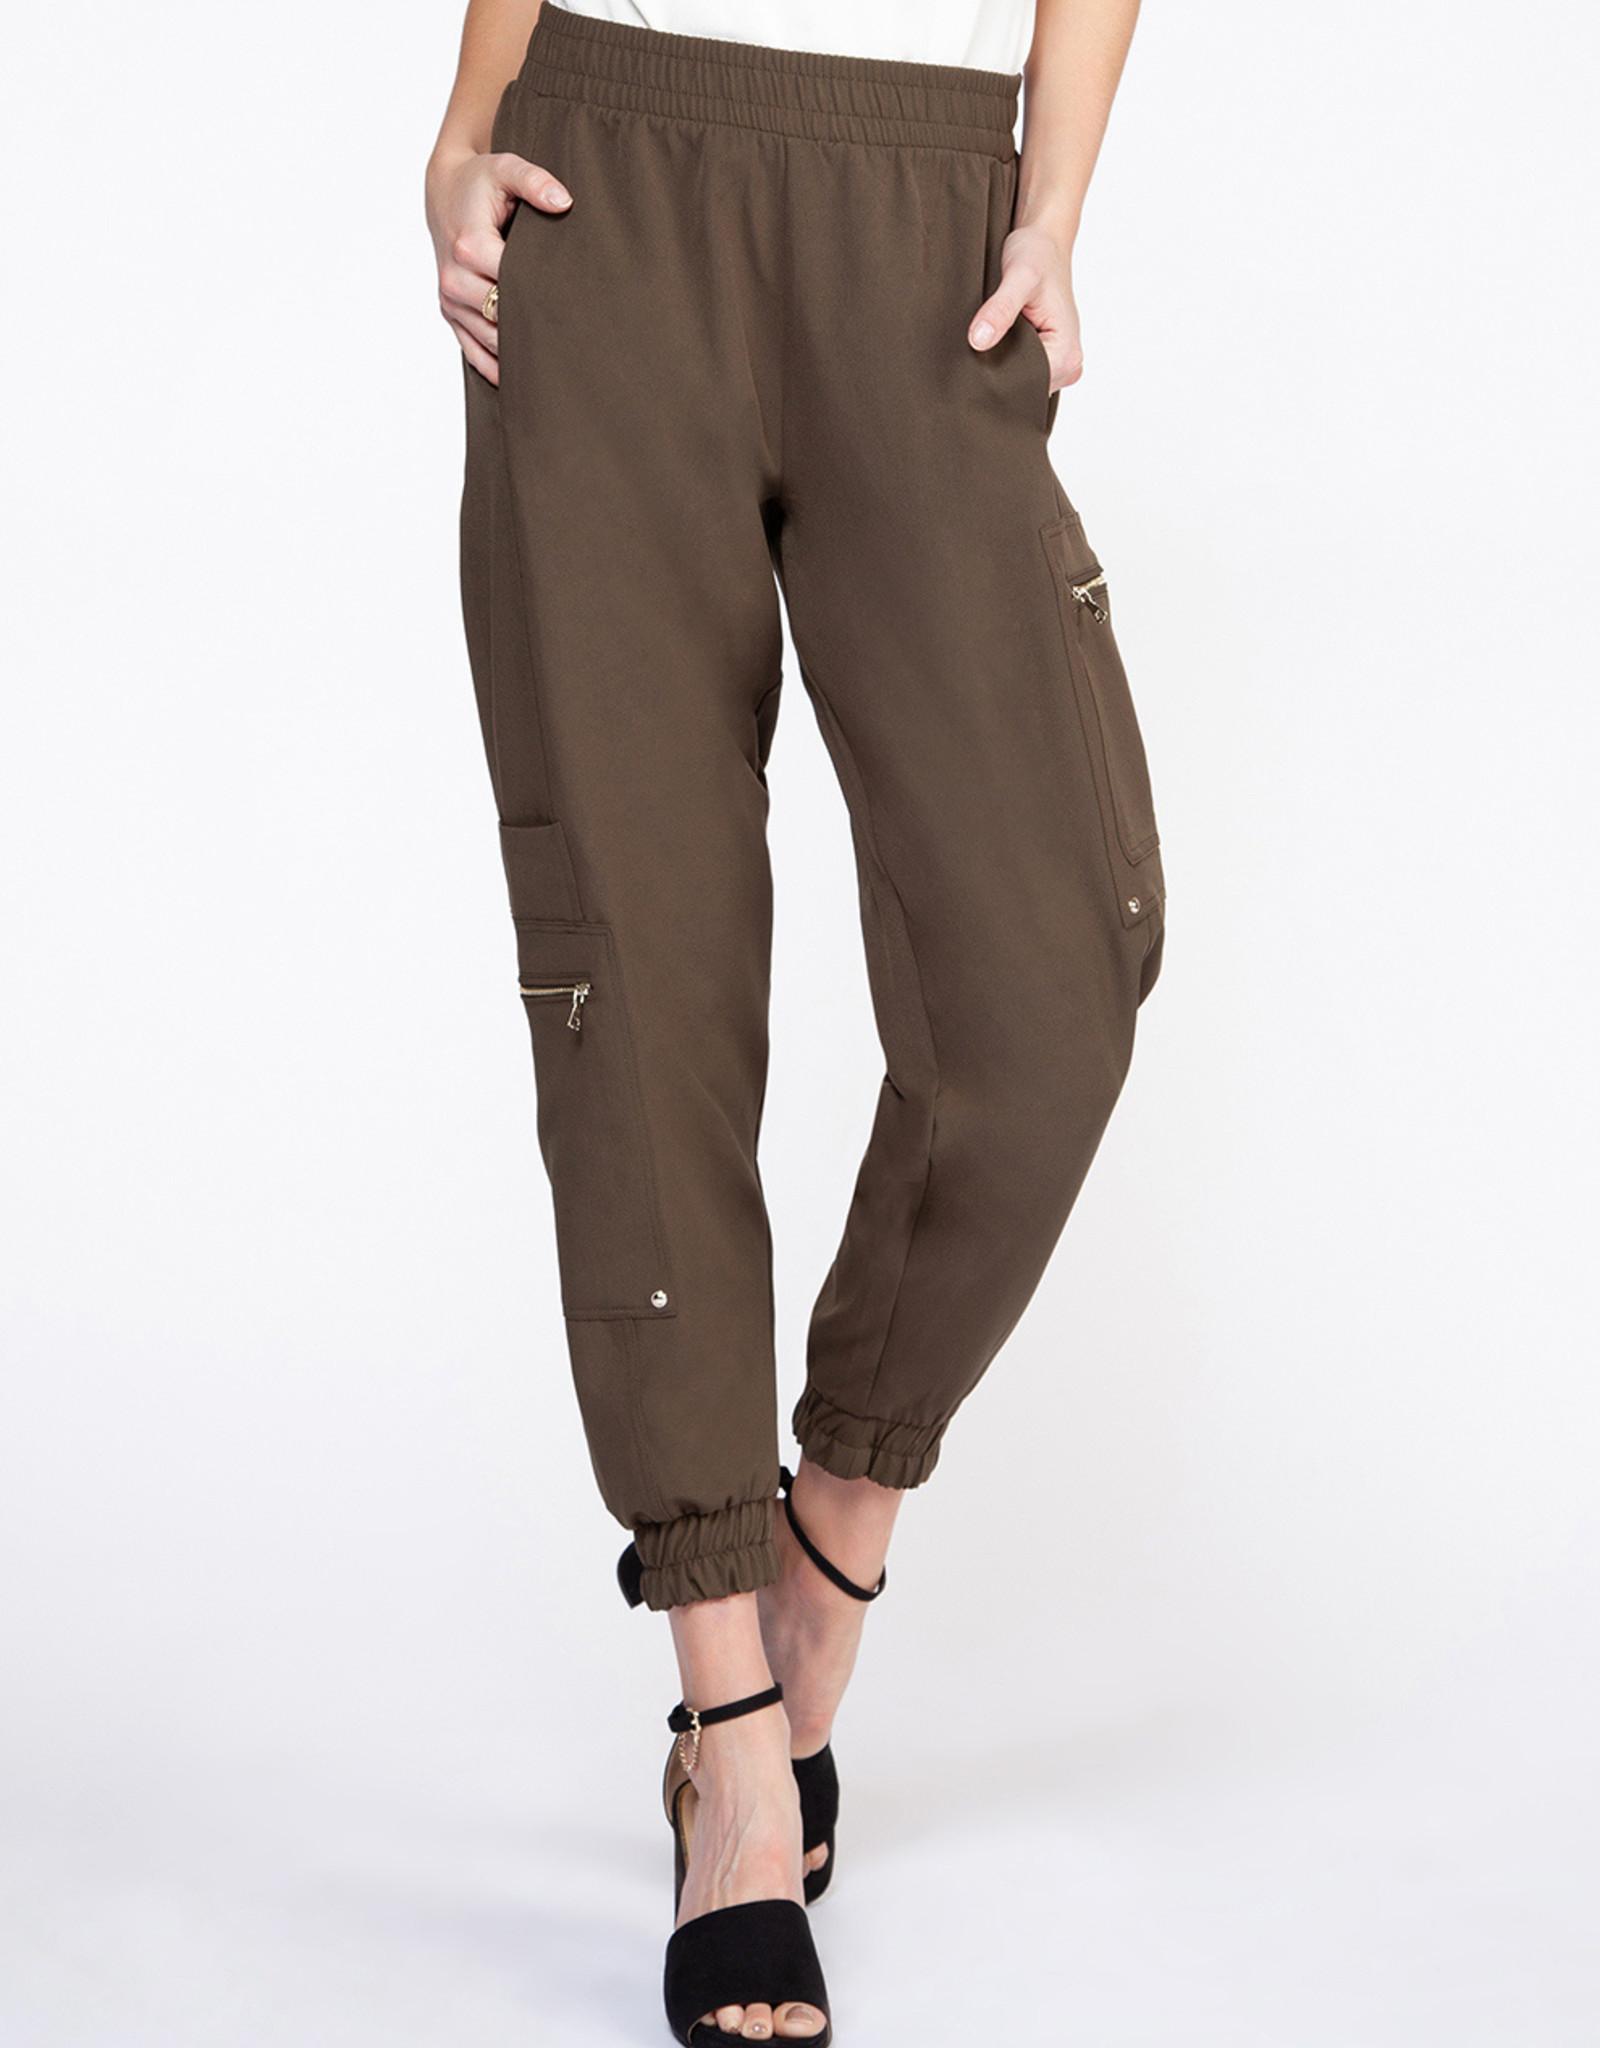 Black Tape Army Cargo Pants